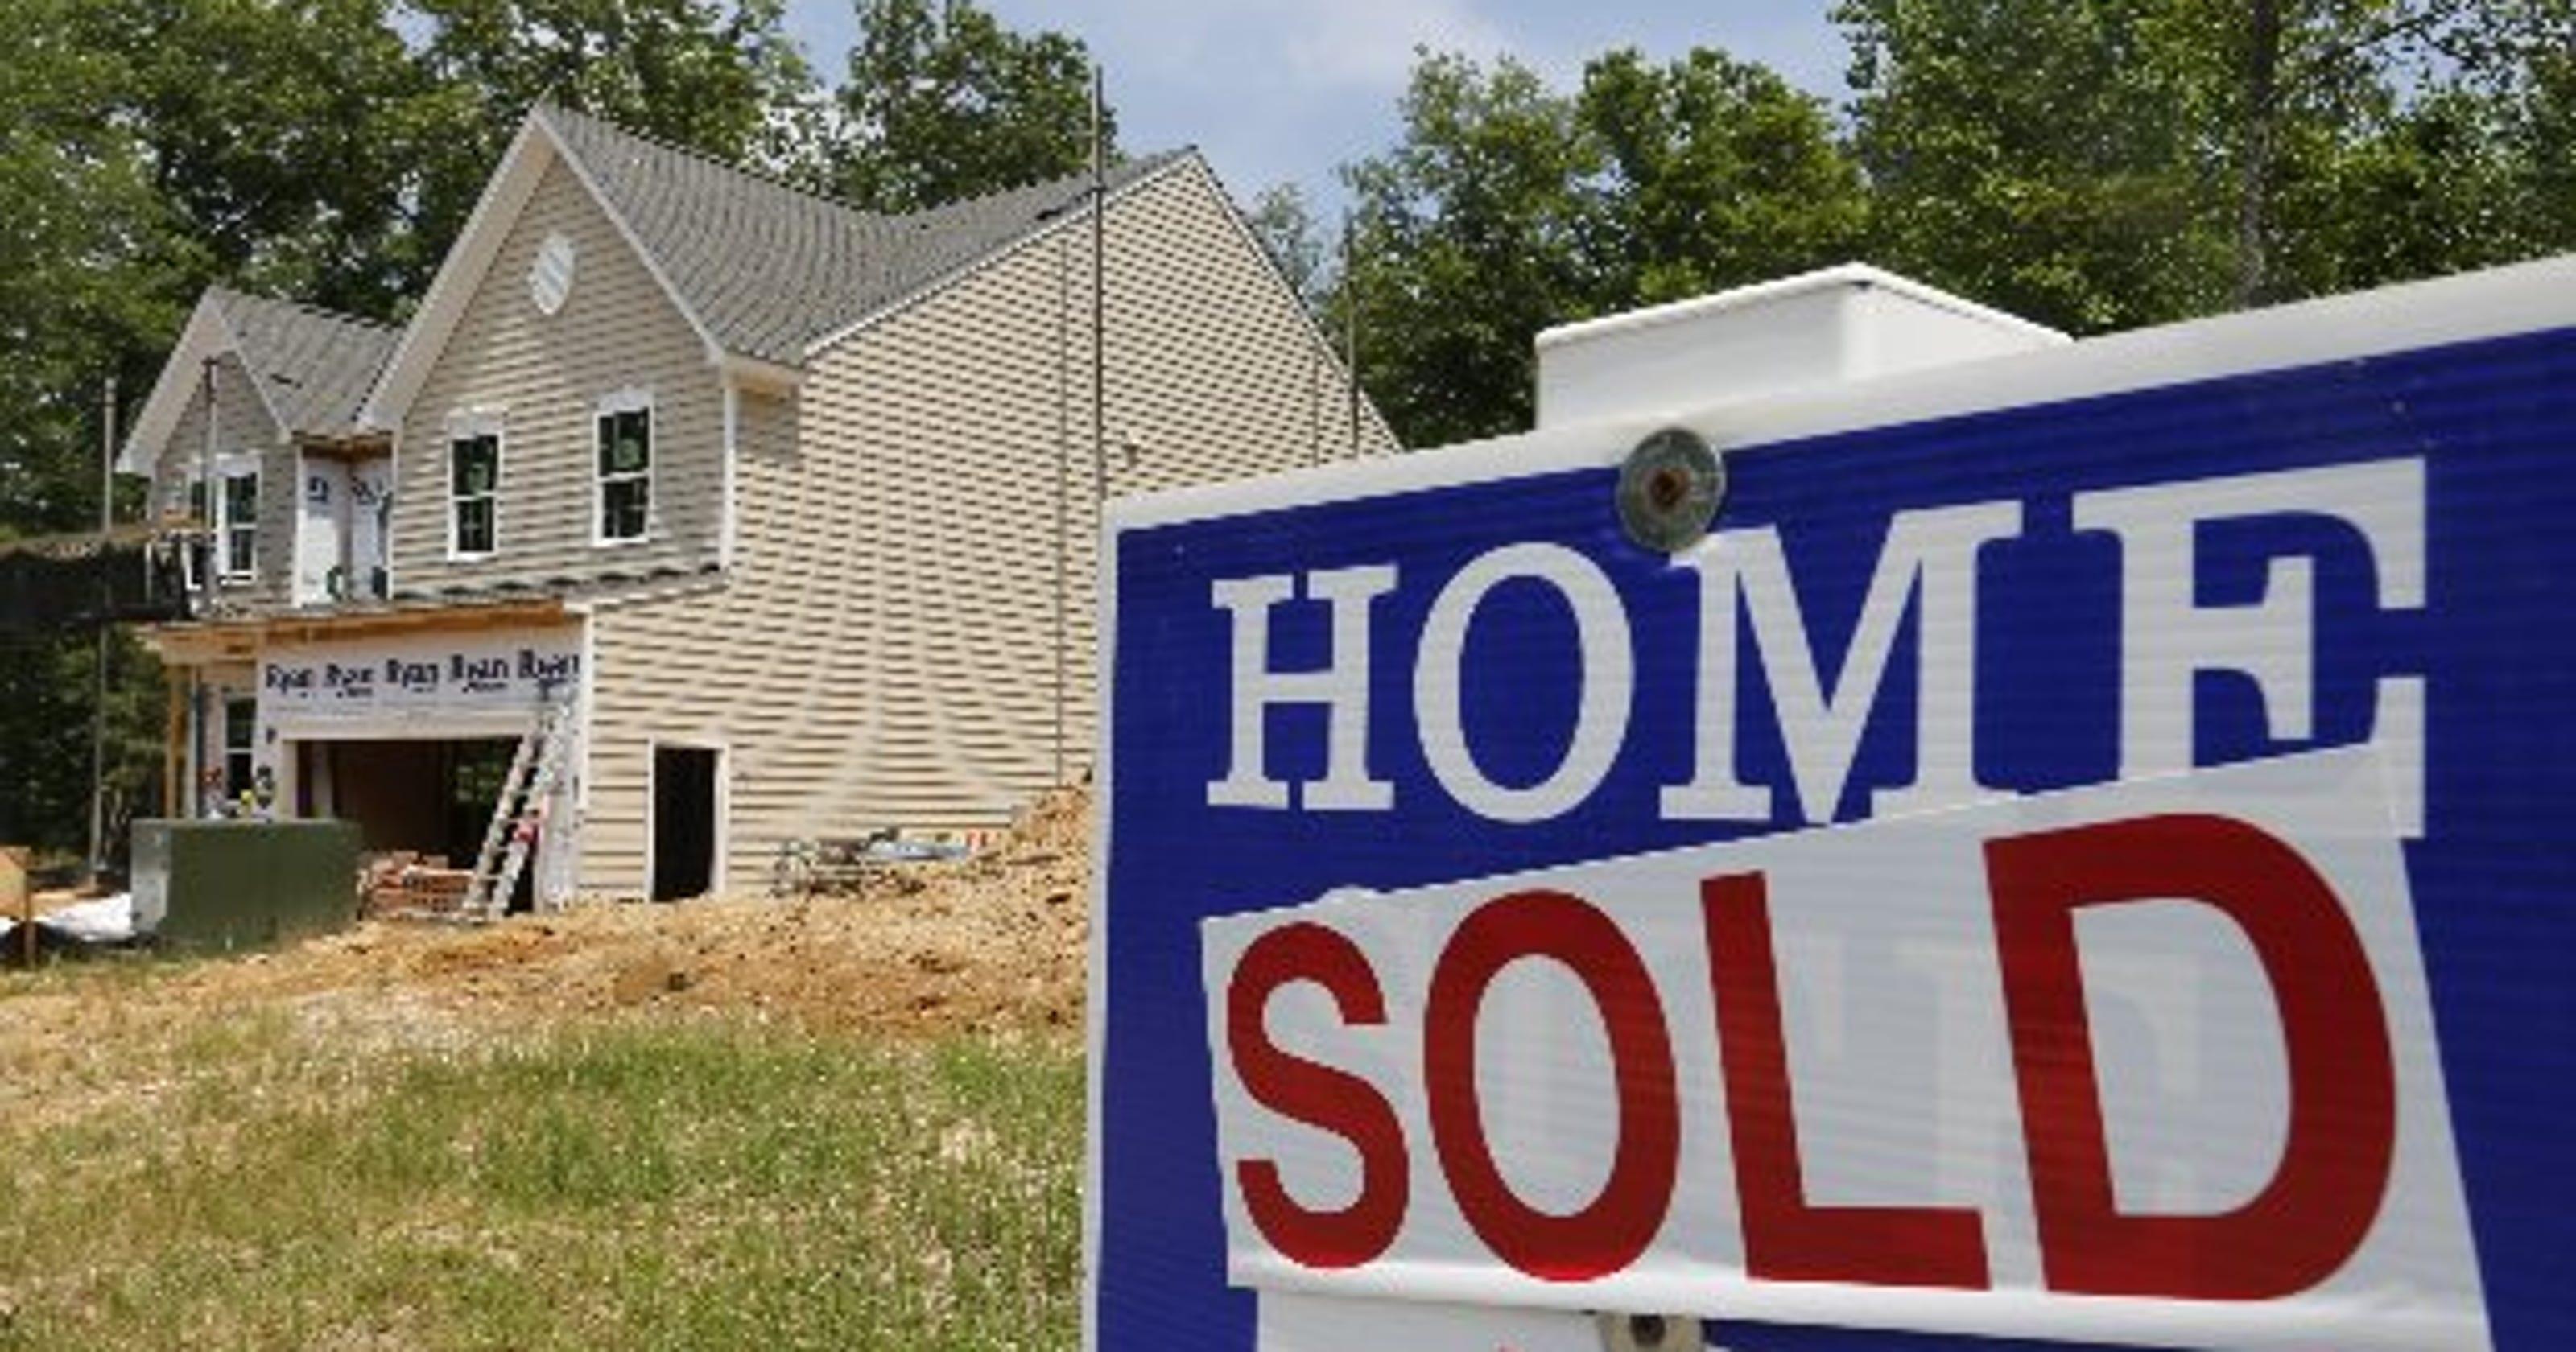 Home prices rising across metro area, especially Detroit